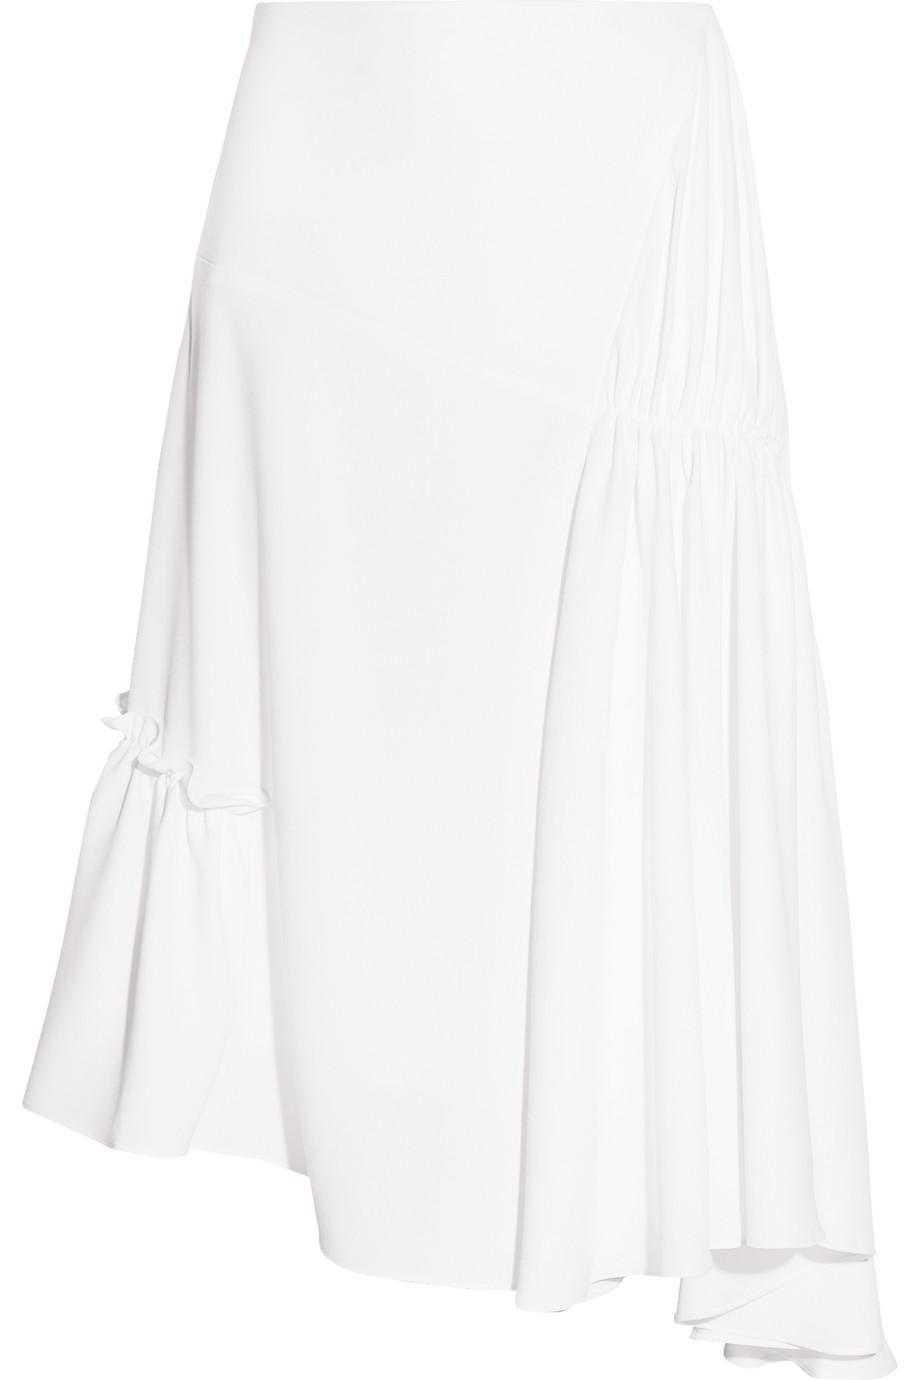 J.W.Anderson Asymmetric Ruched Crepe Midi Skirt, White, Women's, Size: 6